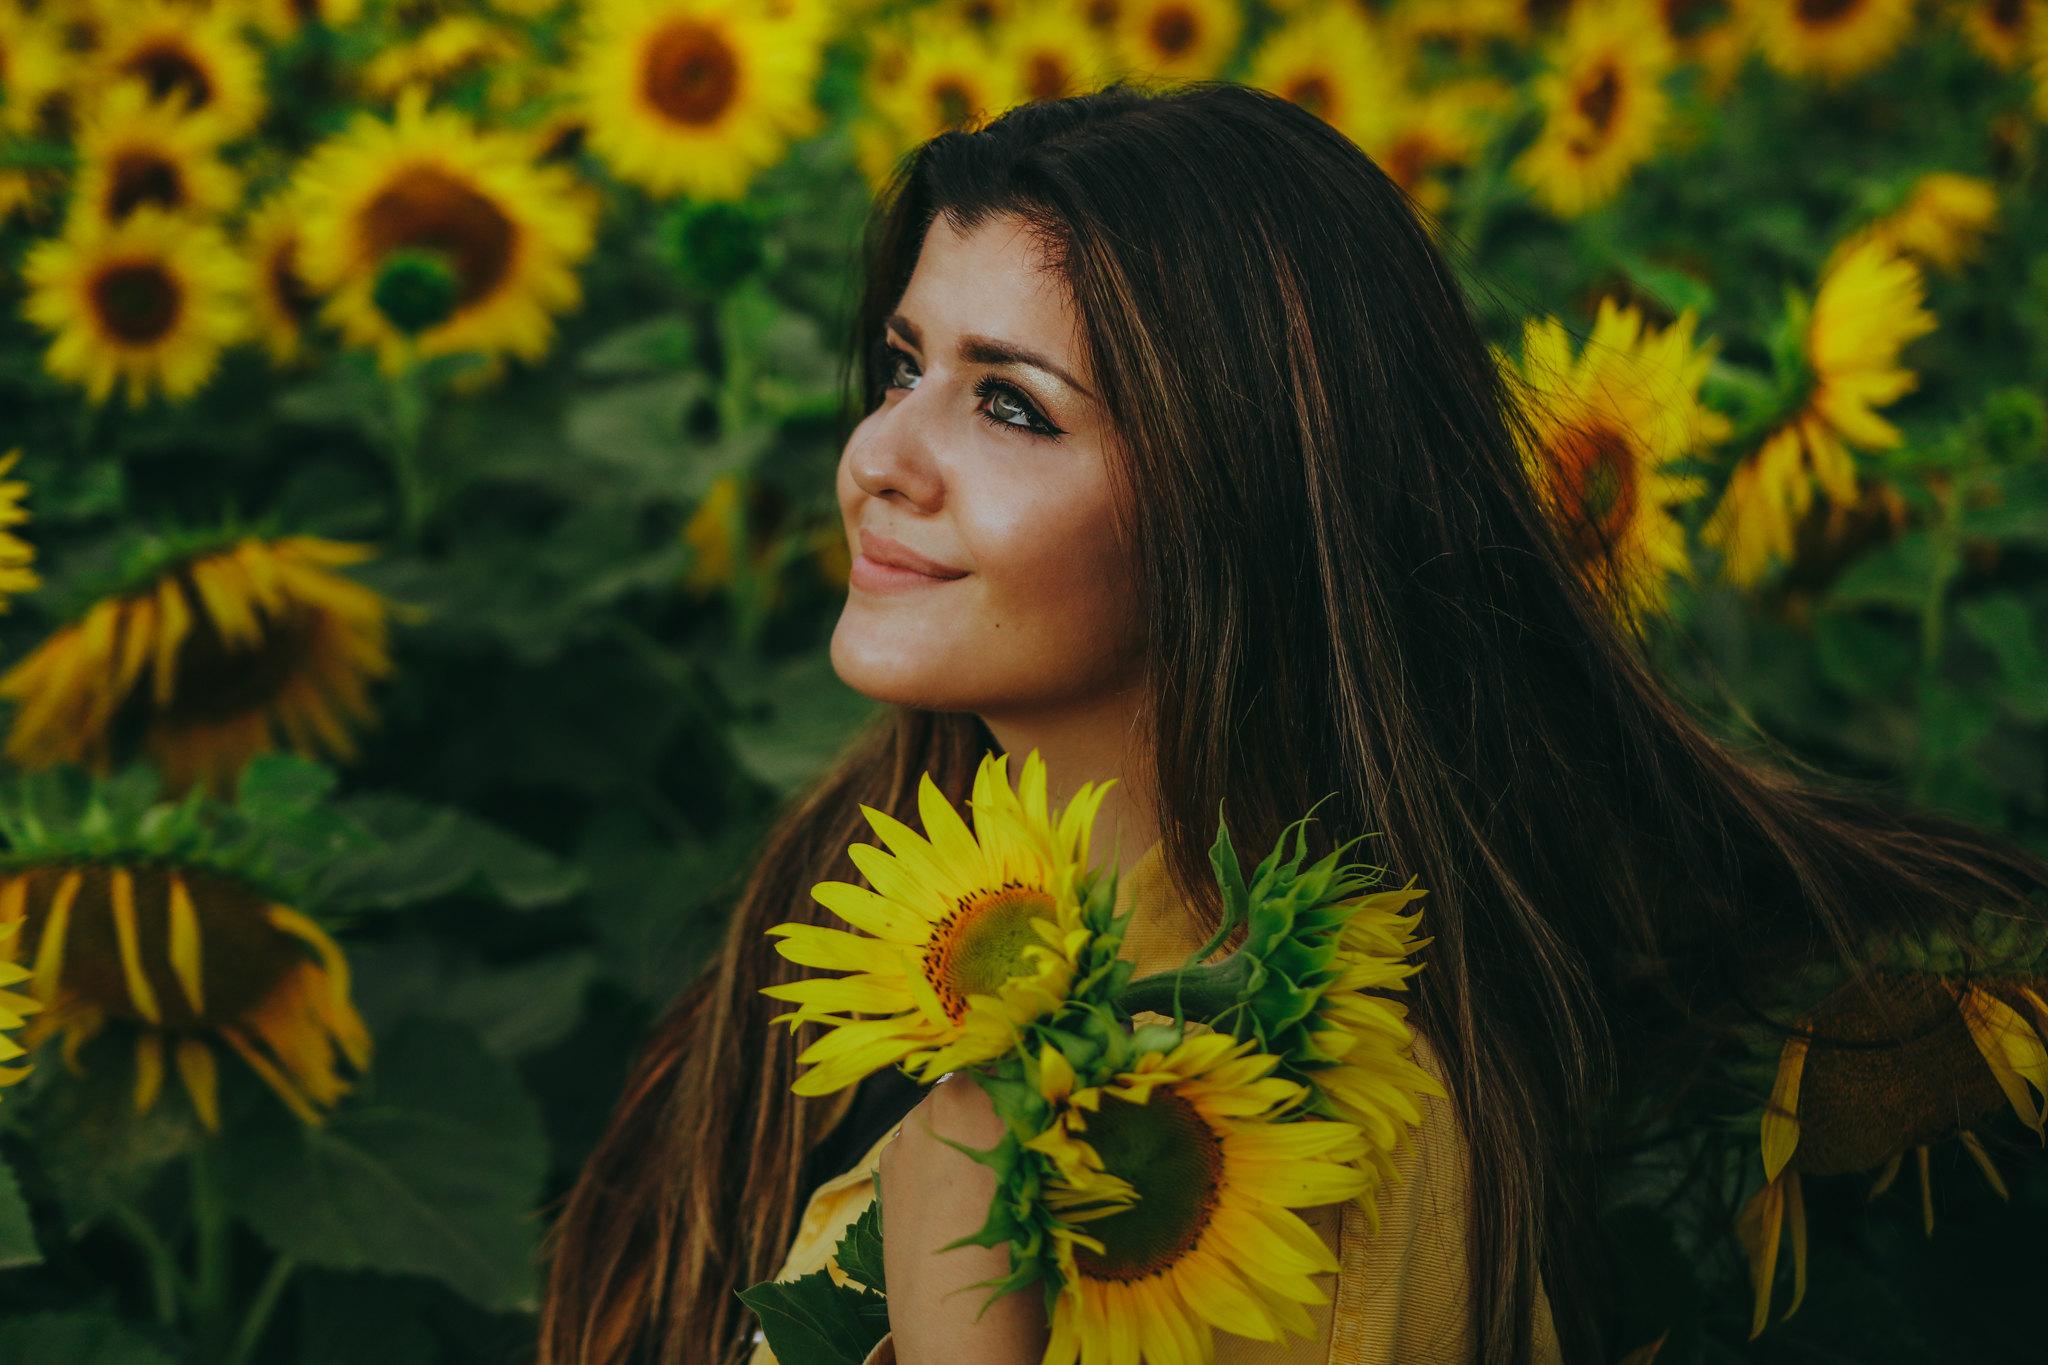 auringonkukkia-31